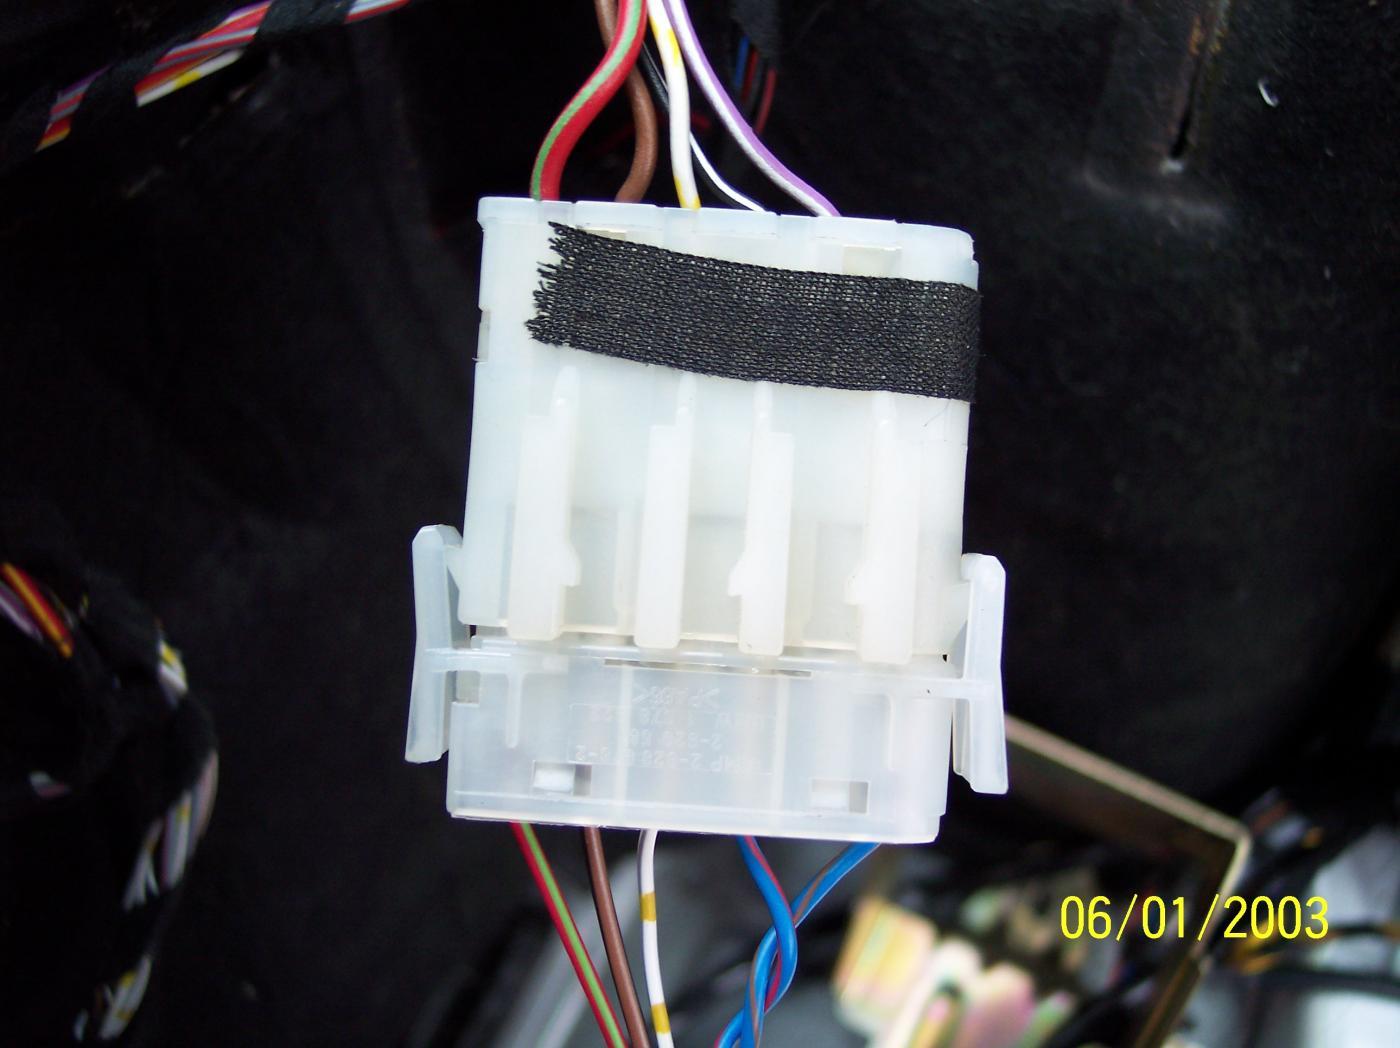 Pleasant E39 Mk4 Sat Nav Issue Please Help Xoutpost Com Wiring Cloud Histehirlexornumapkesianilluminateatxorg